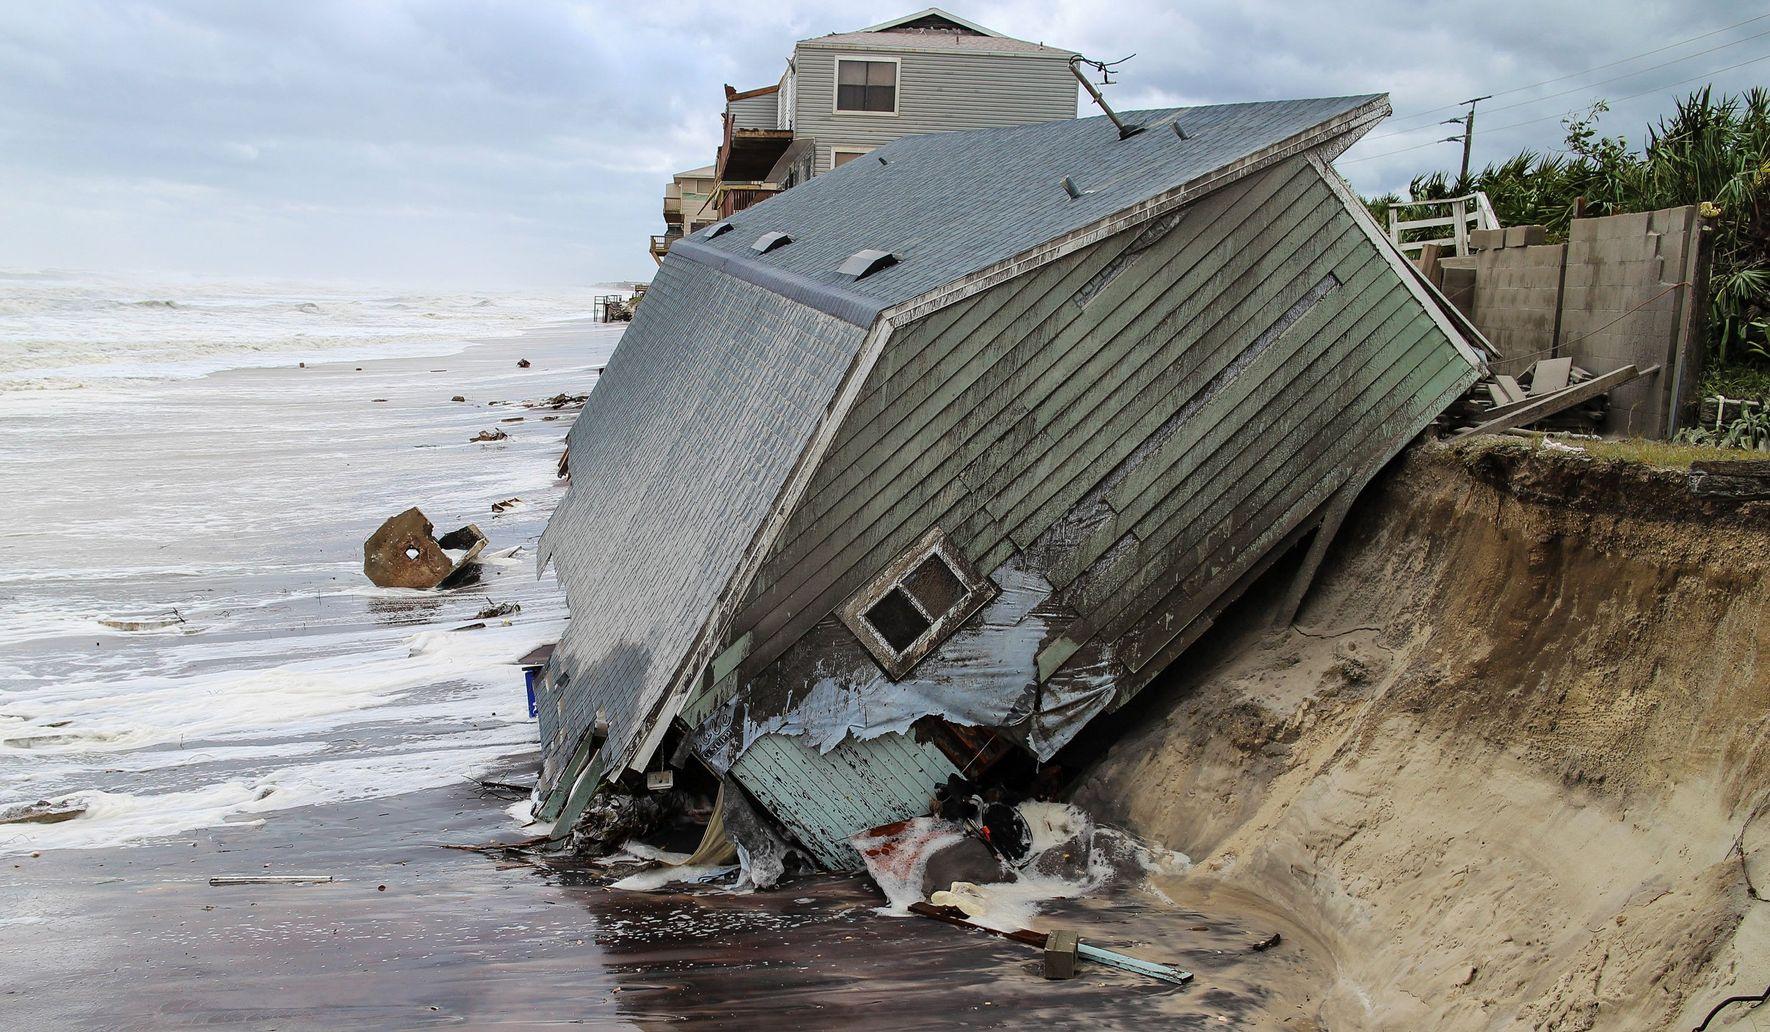 Climate change activists want punishment for skeptics